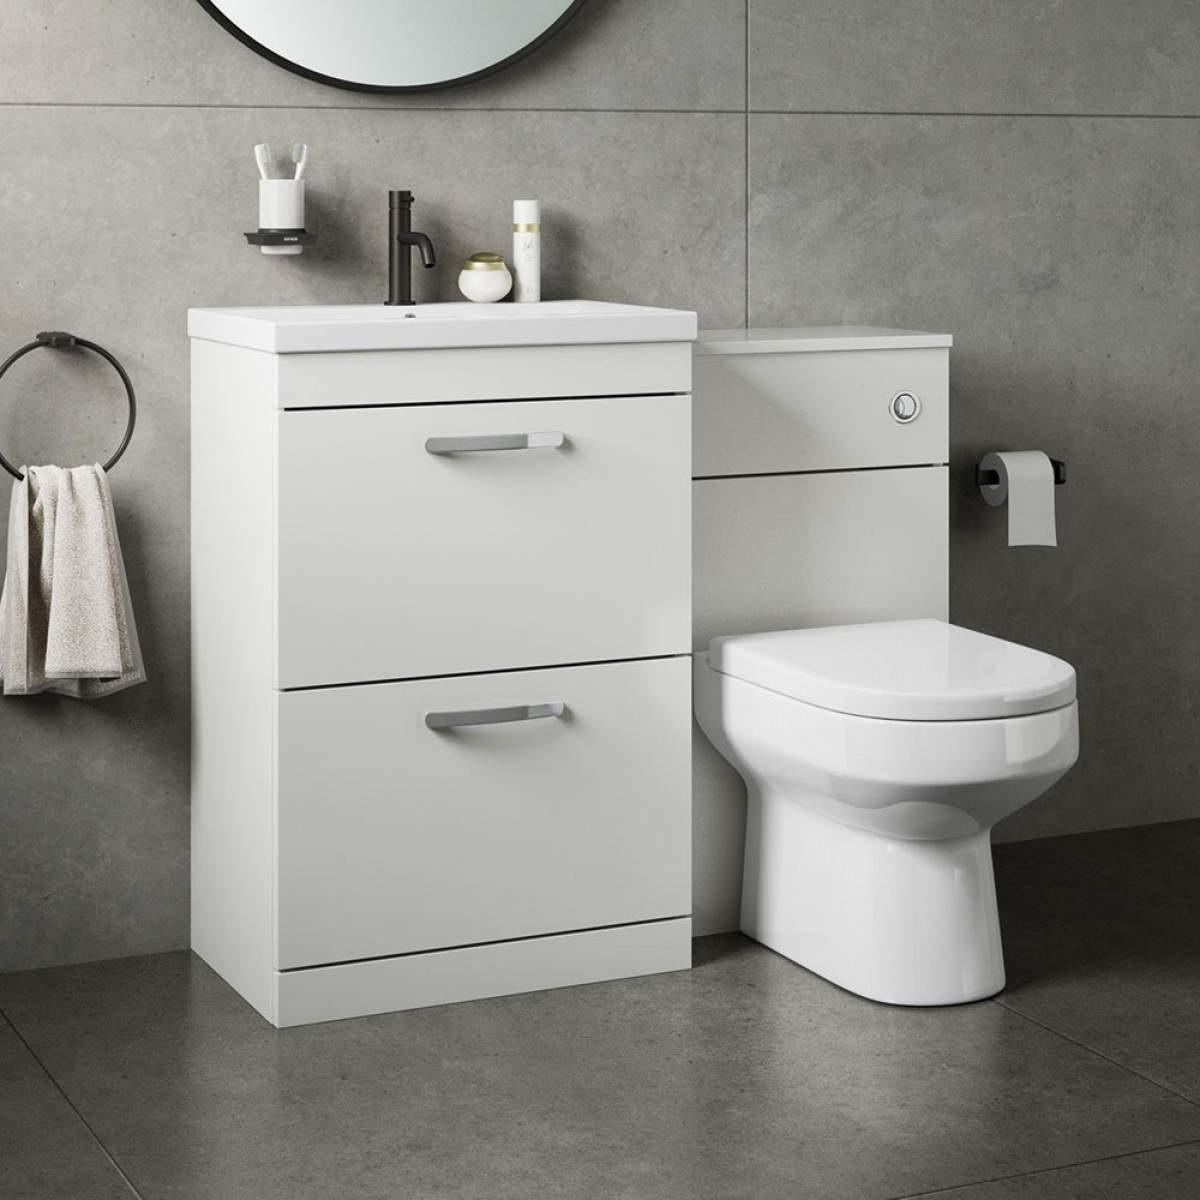 Units Lavatory Saving Vanity Small Shower Bathroom within dimensions 1200 X 1200